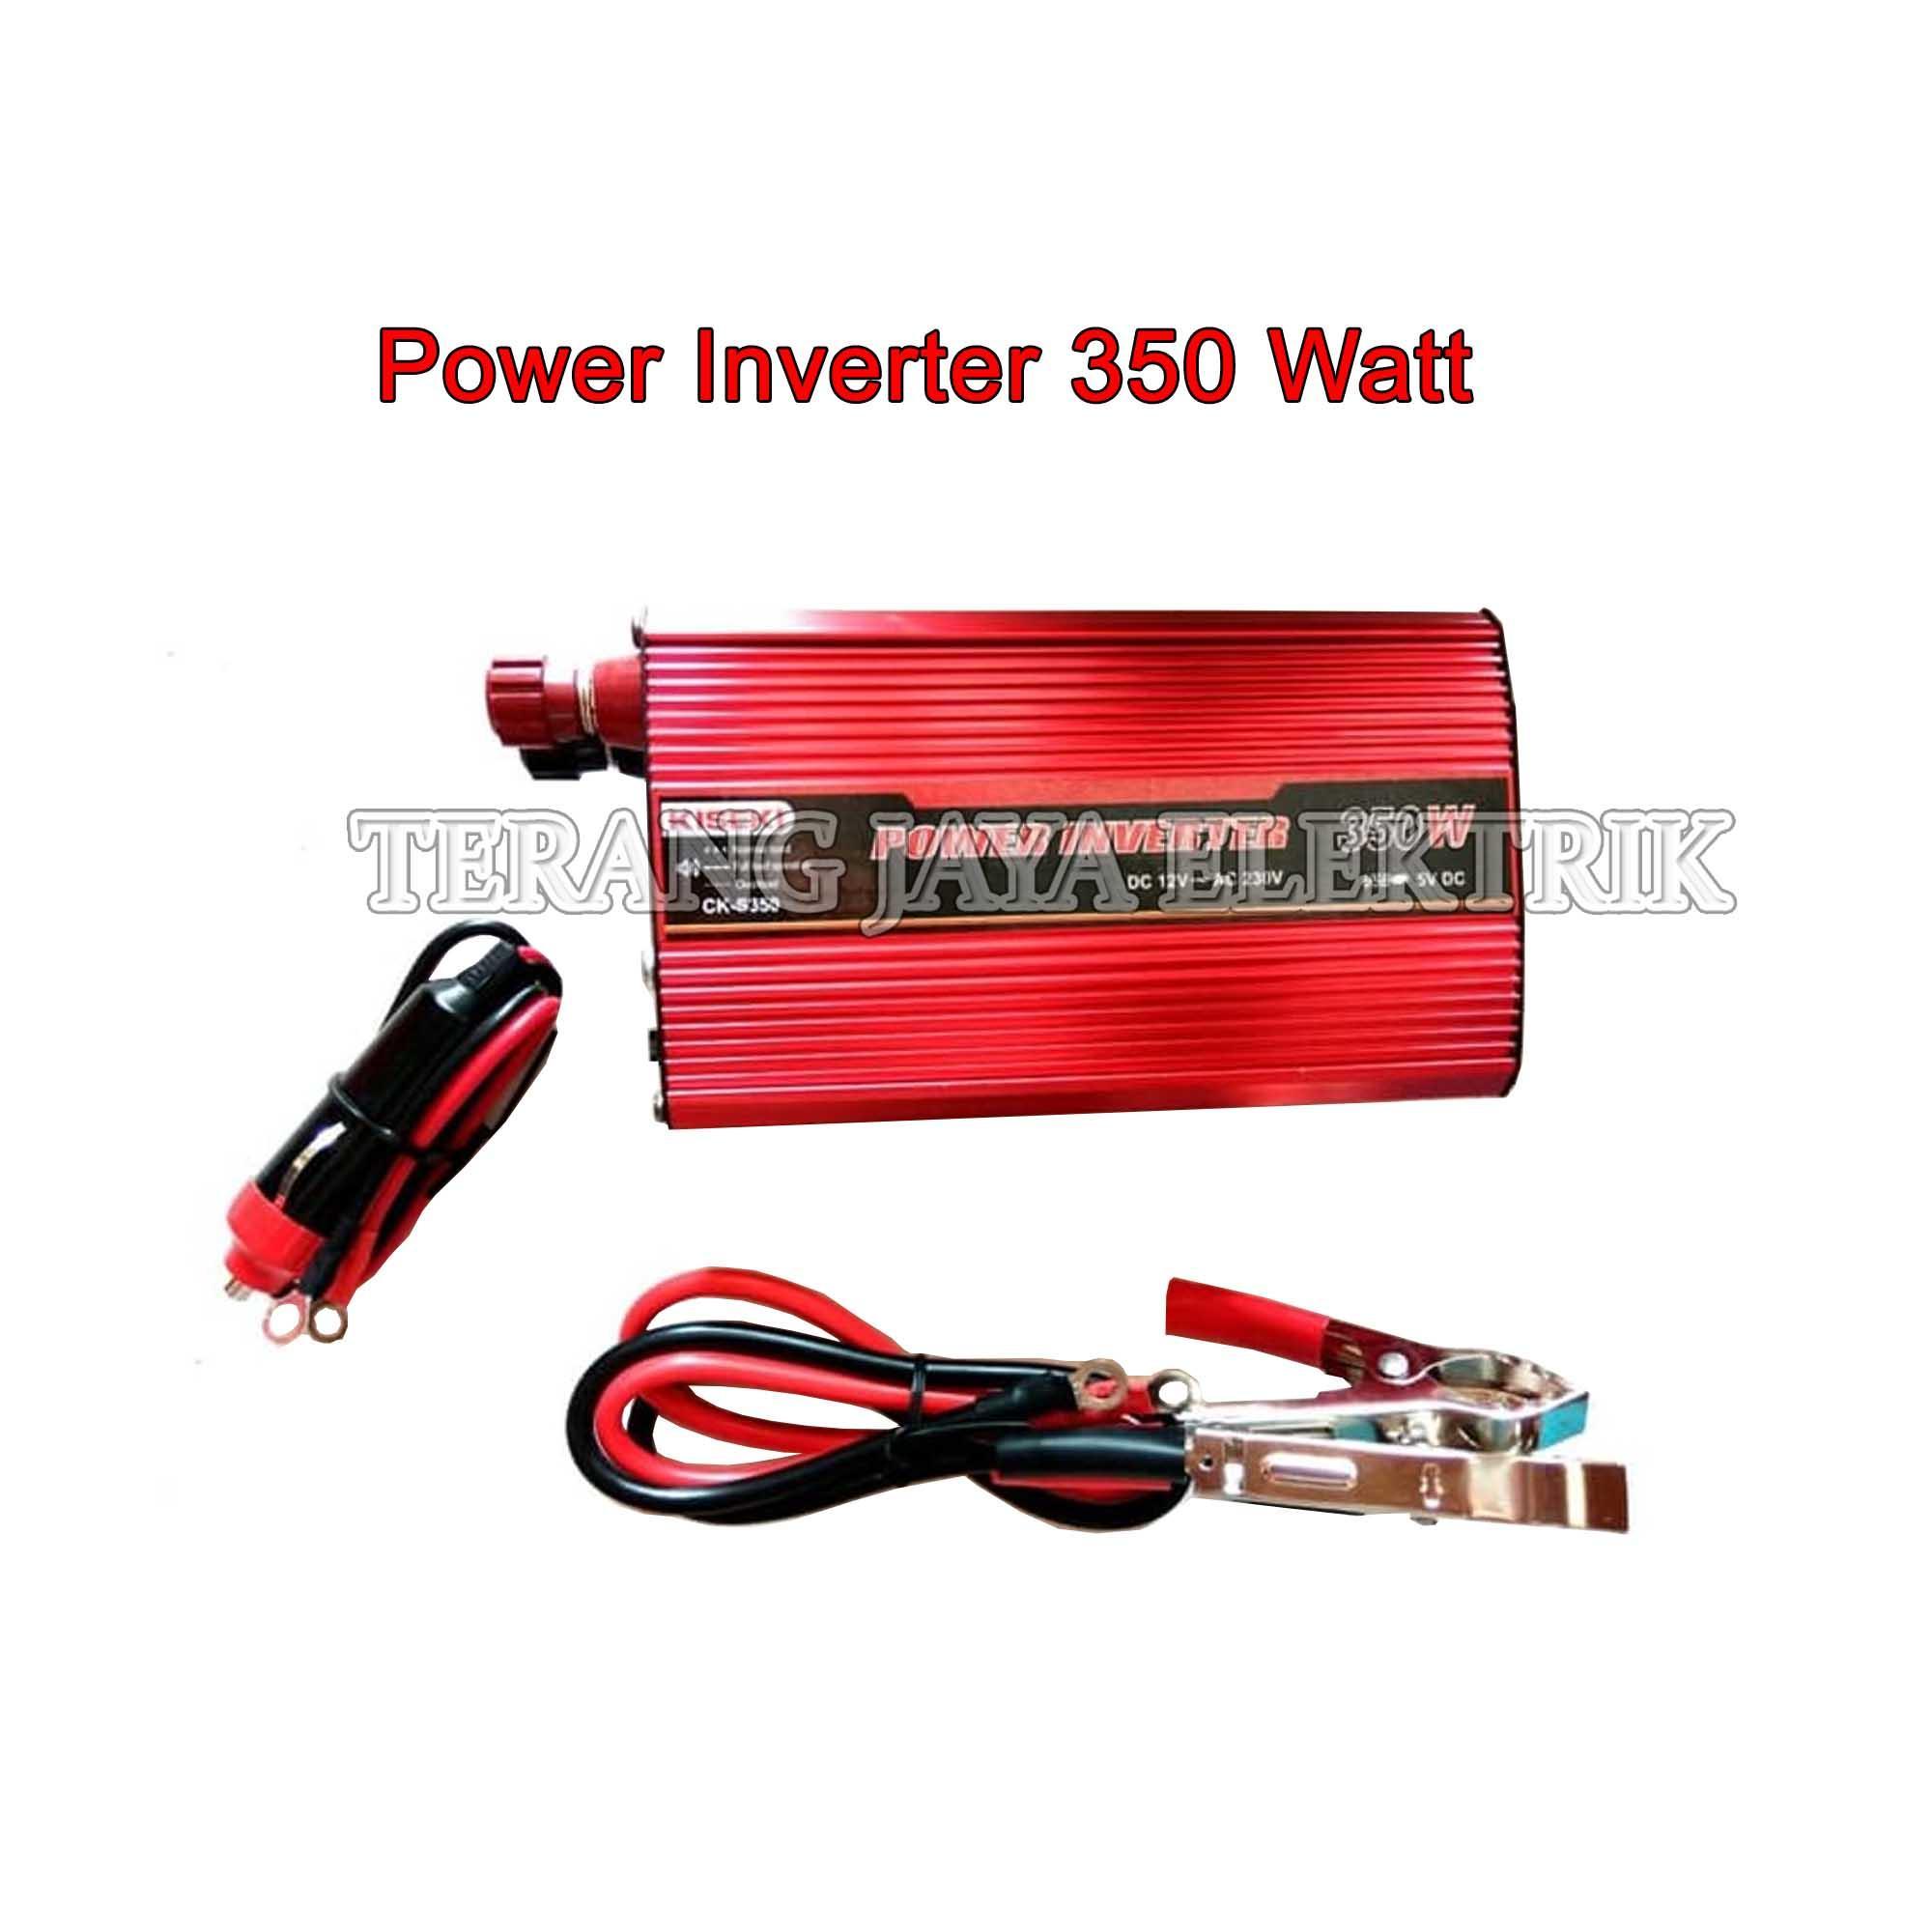 Power Inverter / Perubah Arus Aki DC 12V ke AC 220V 350 Watt Kiseki